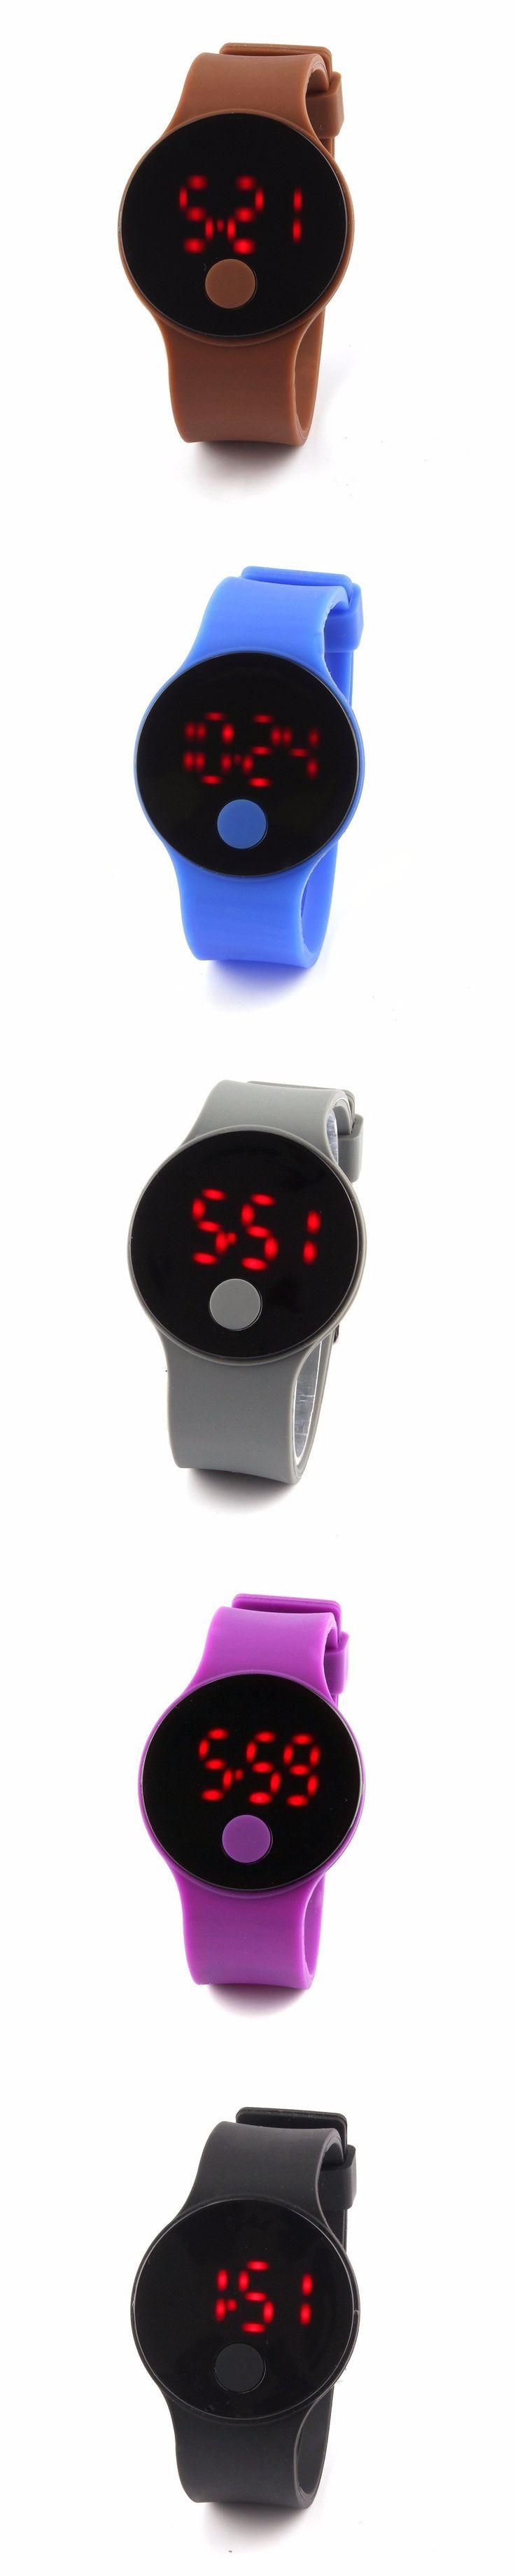 2017 Hot fashion digital watch design LED Watch Men Women Cheap silicone Electronic Digital sport wristwatch relogio masculino